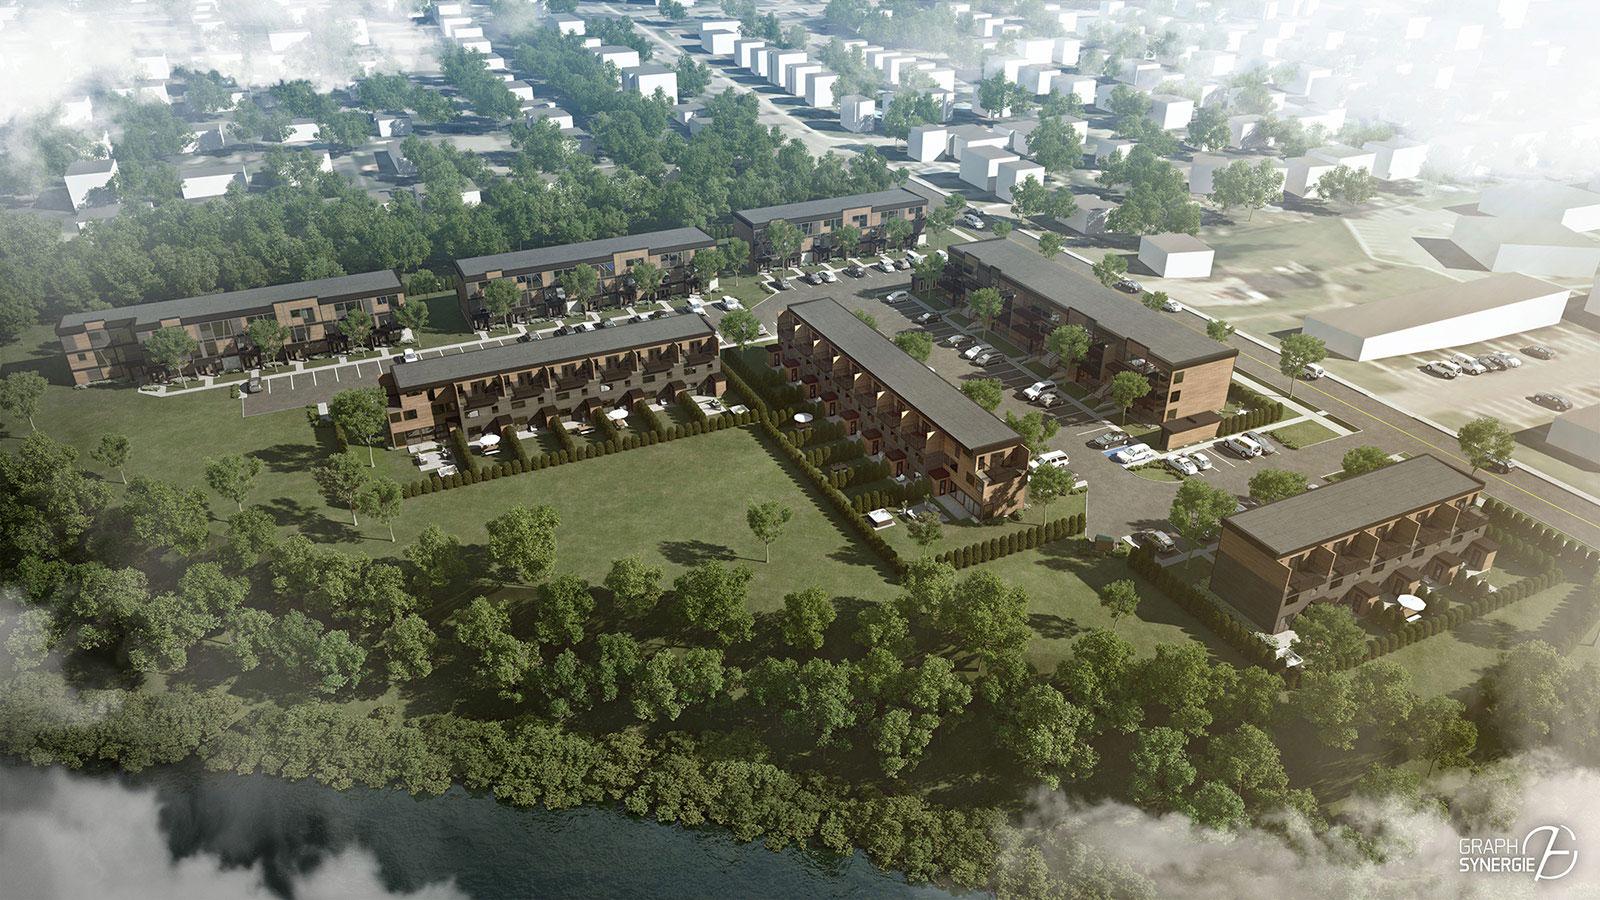 Complexe de condos pour retraites Ekla Sainte-Foy Image 14